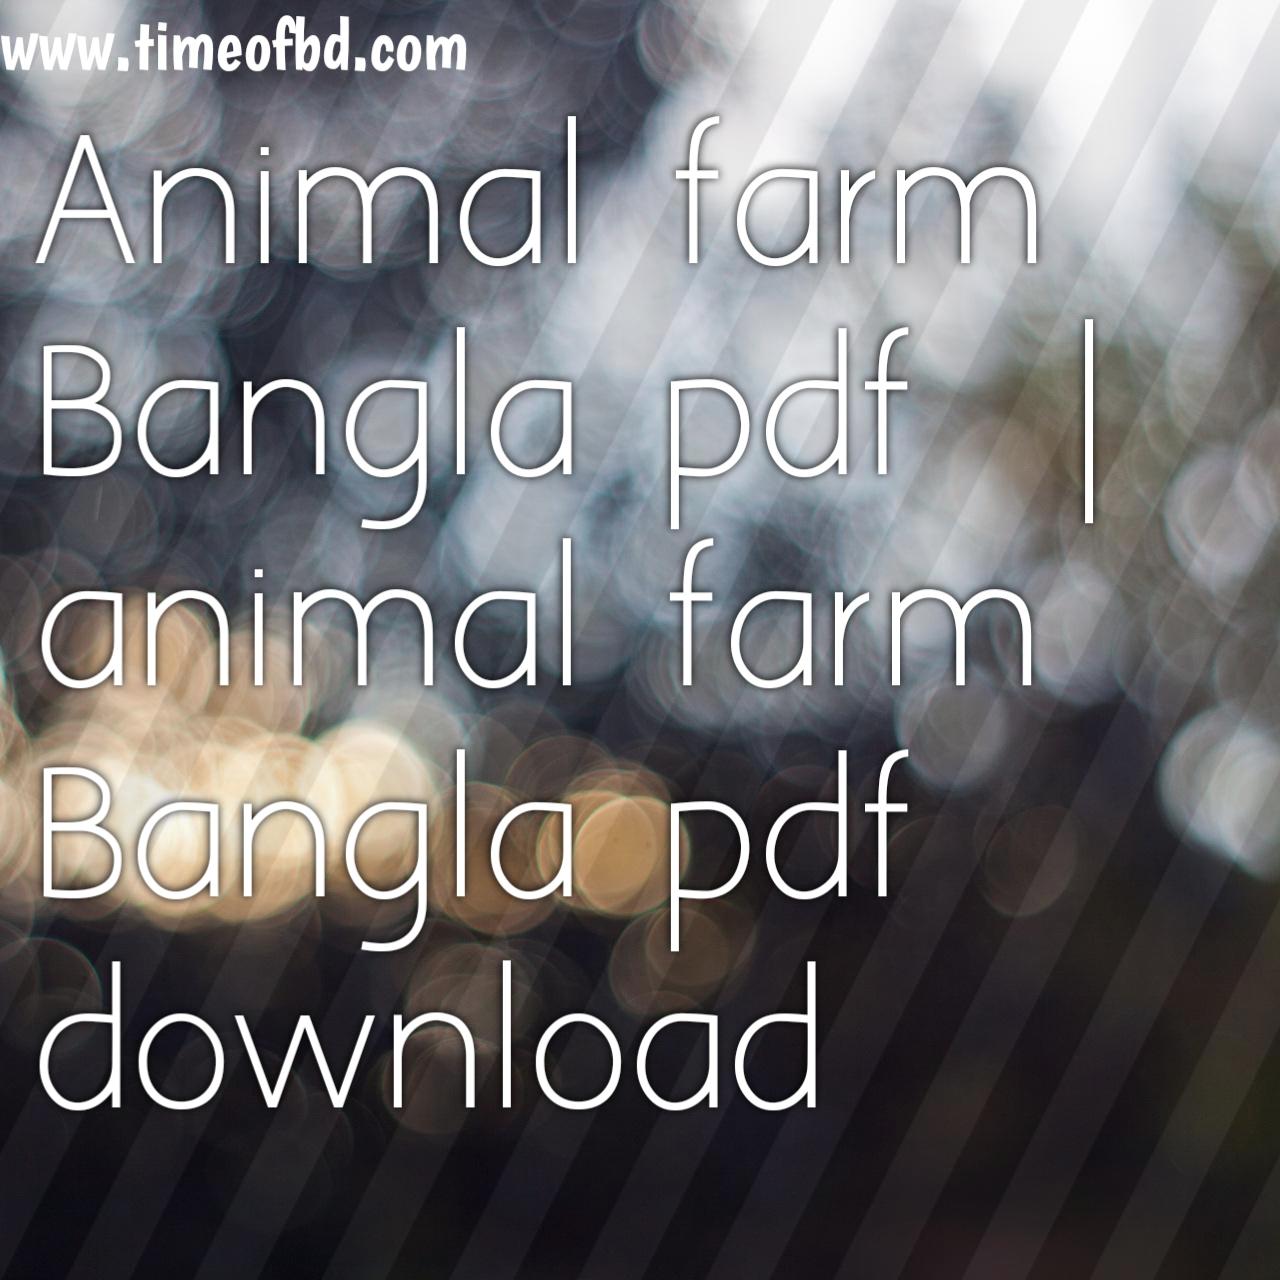 Animal farm Bangla pdf, animal farm Bangla pdf download, animal farm bengali pdf, animal farm pdf bangla